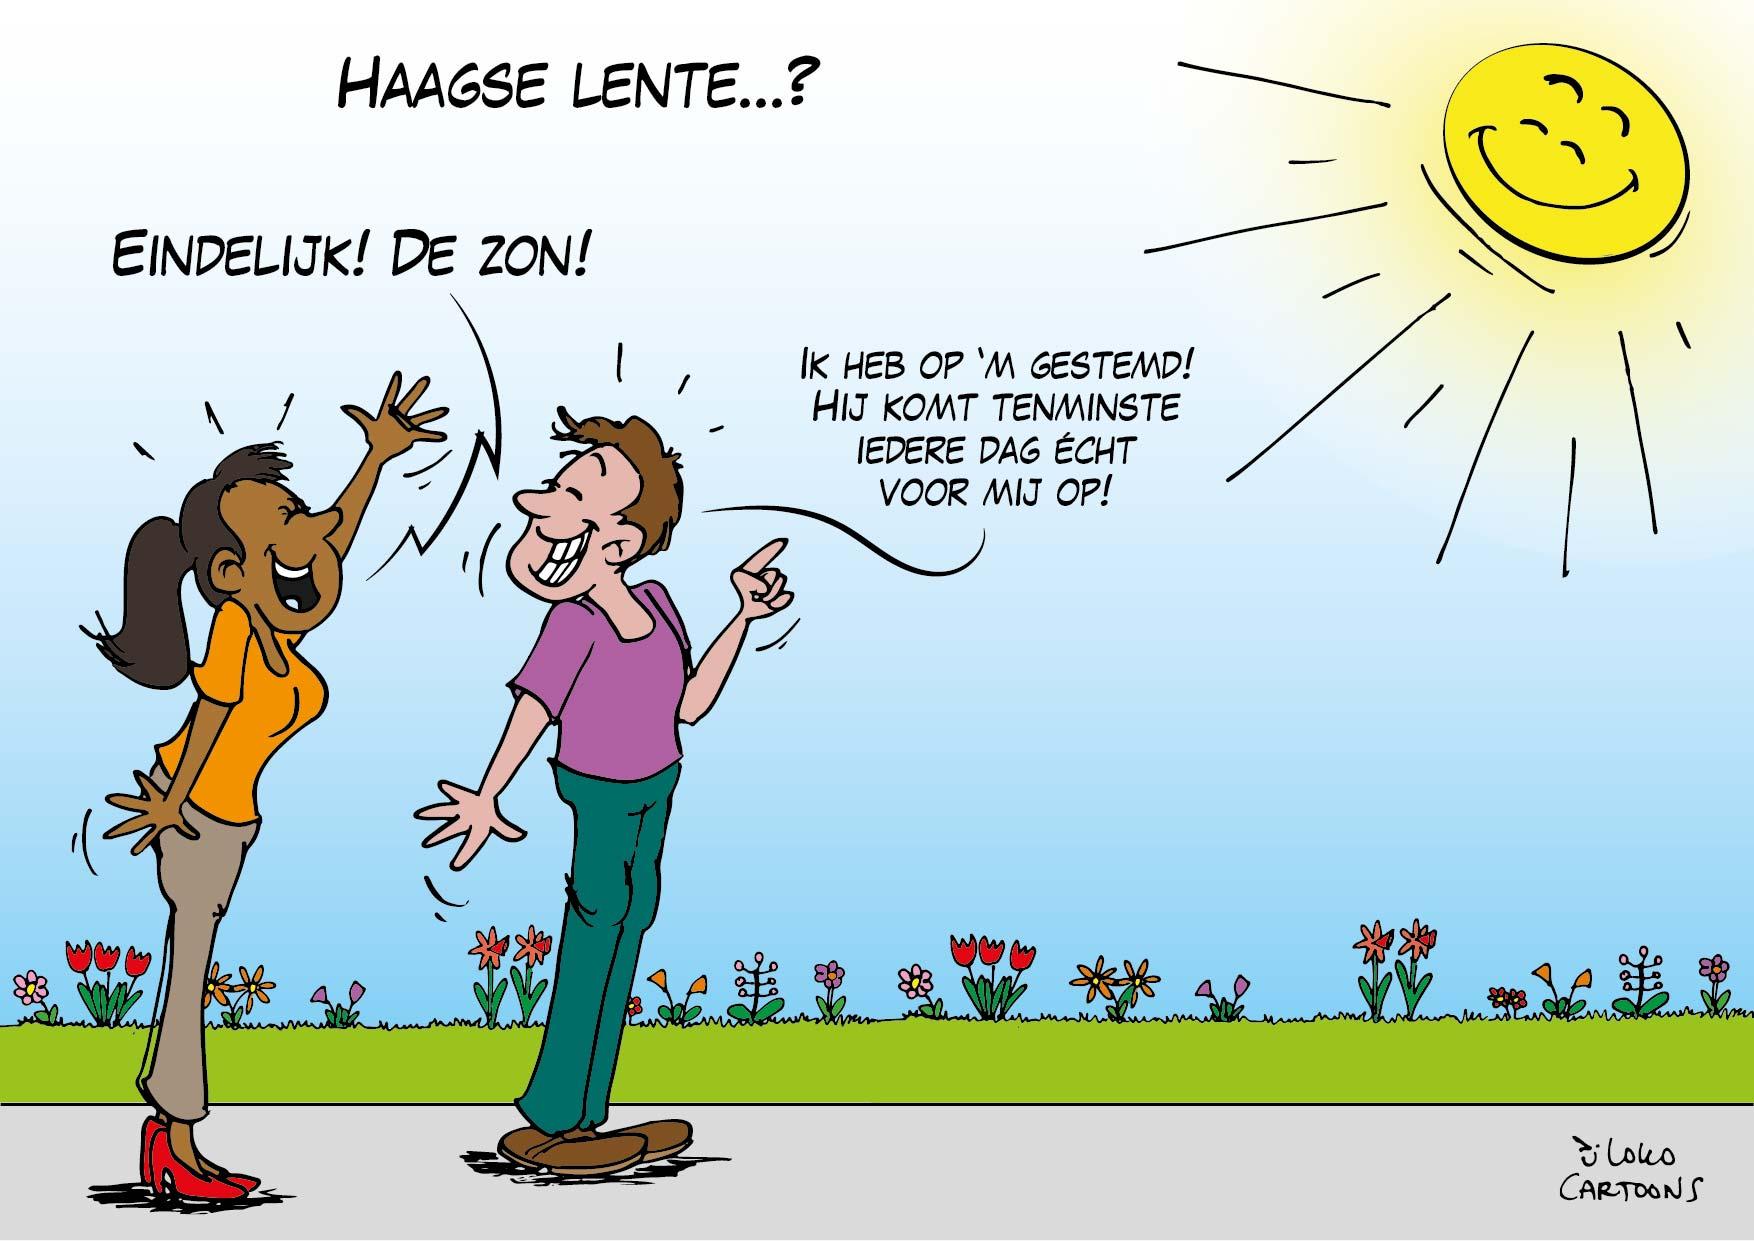 Haagse lente…